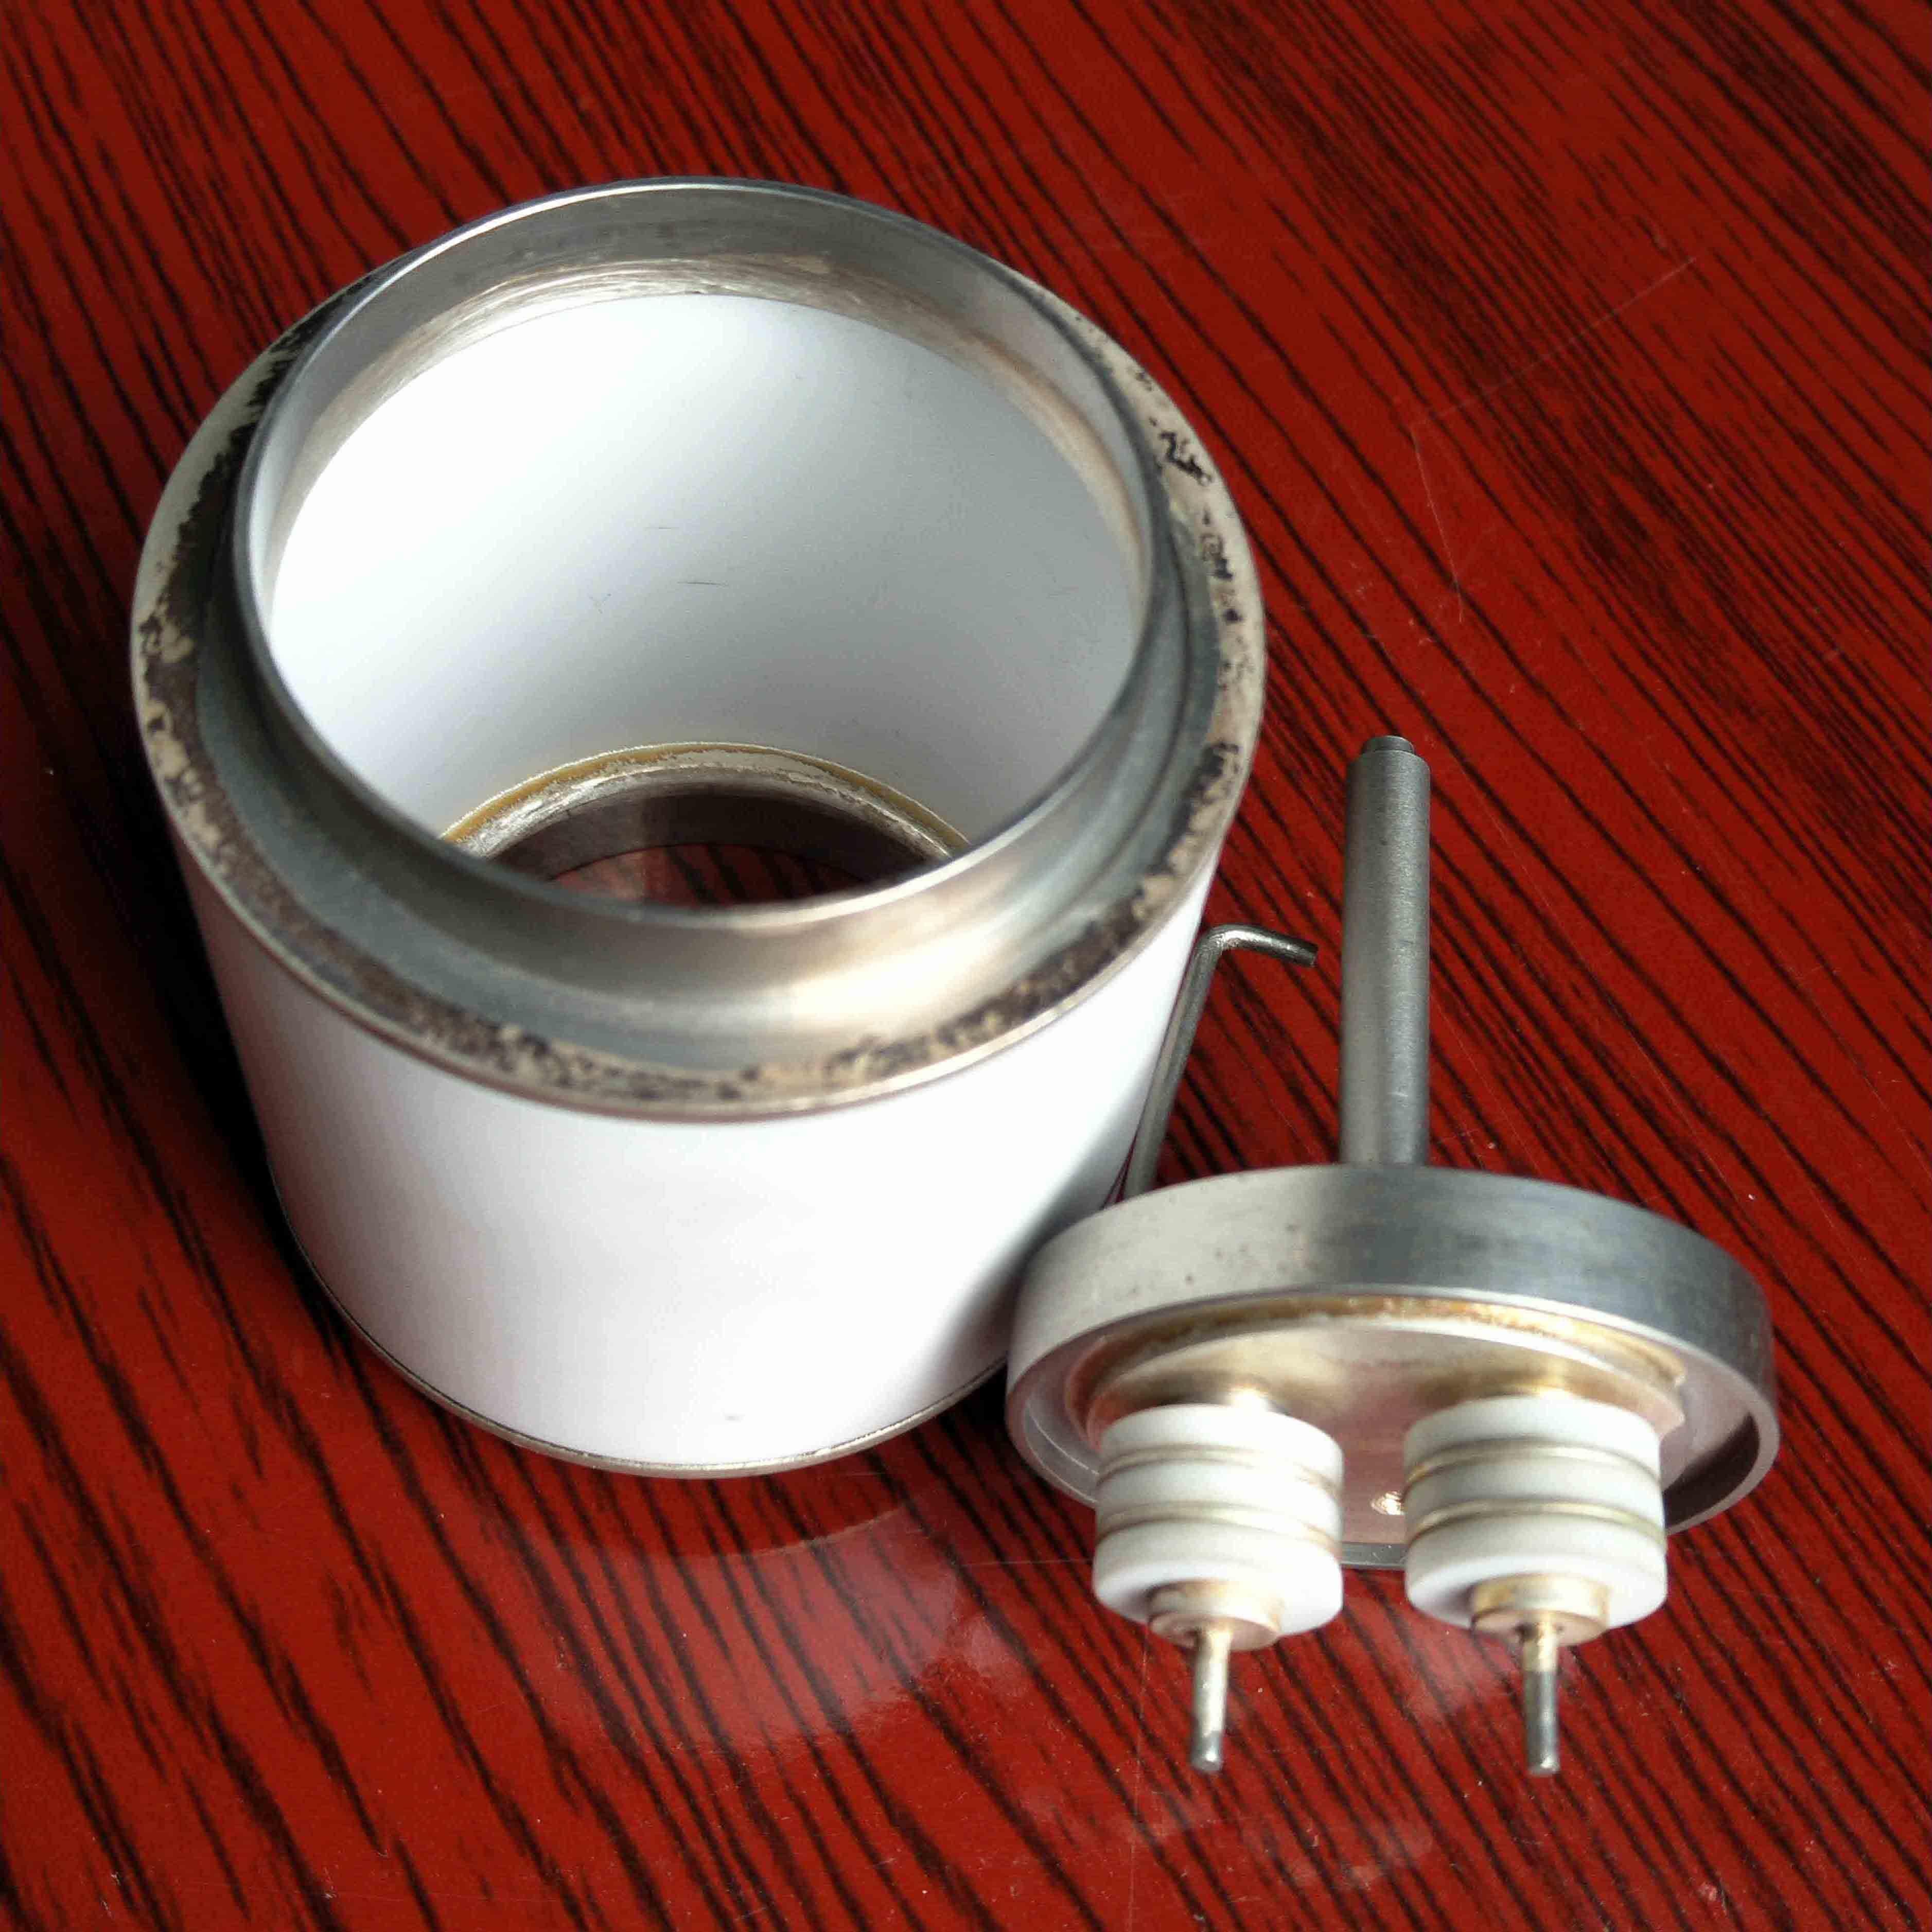 Feed-through Vacuum Brazing-Alumina Ceramic Metal Seal Assemblies by SGJ-International